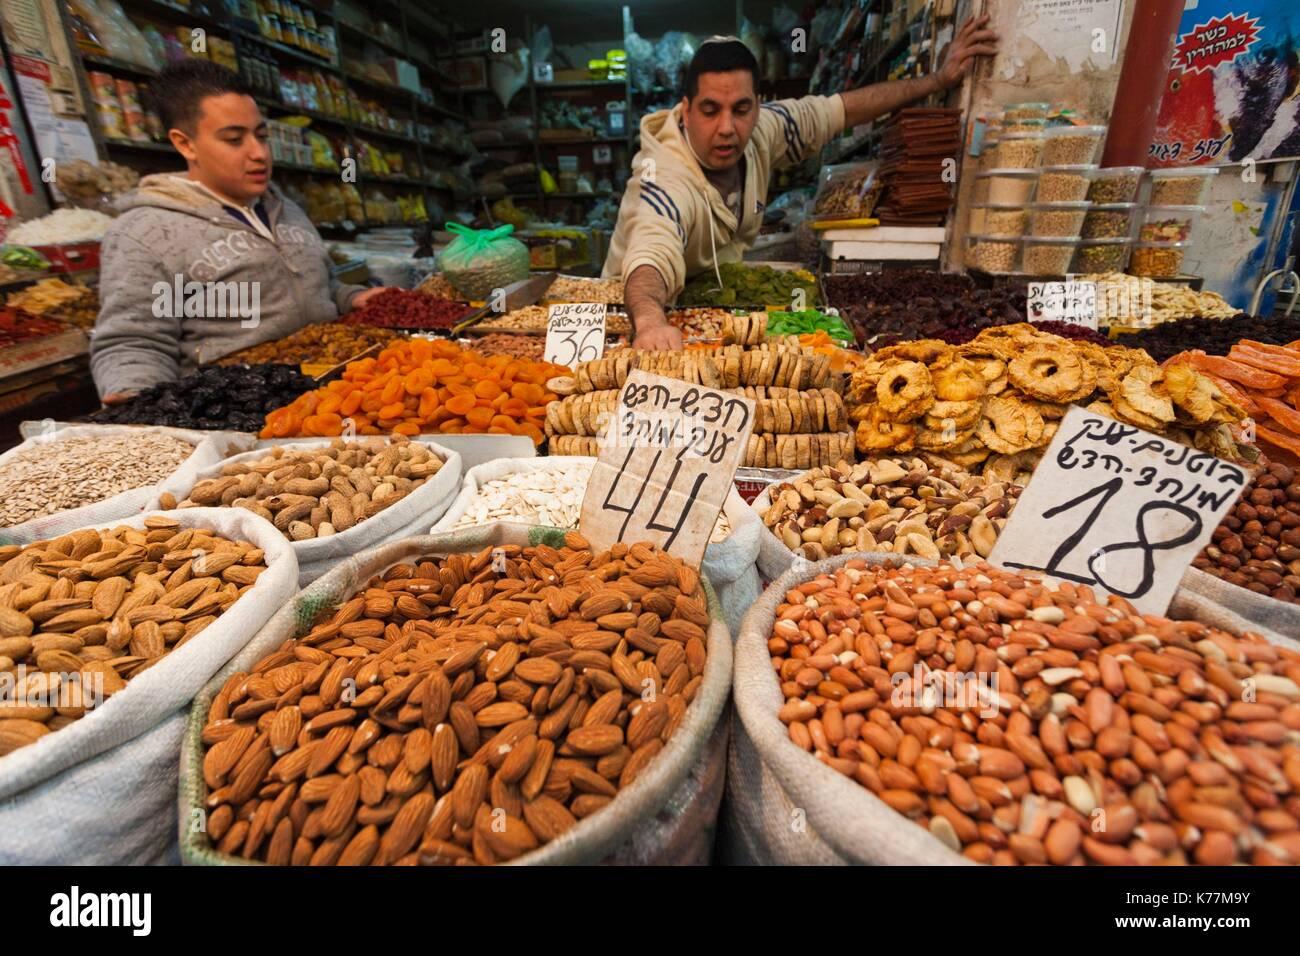 Israel, Jerusalem, neue Stadt, Mahane Yehuda Markt, Mutter Kaufleute, Stockbild